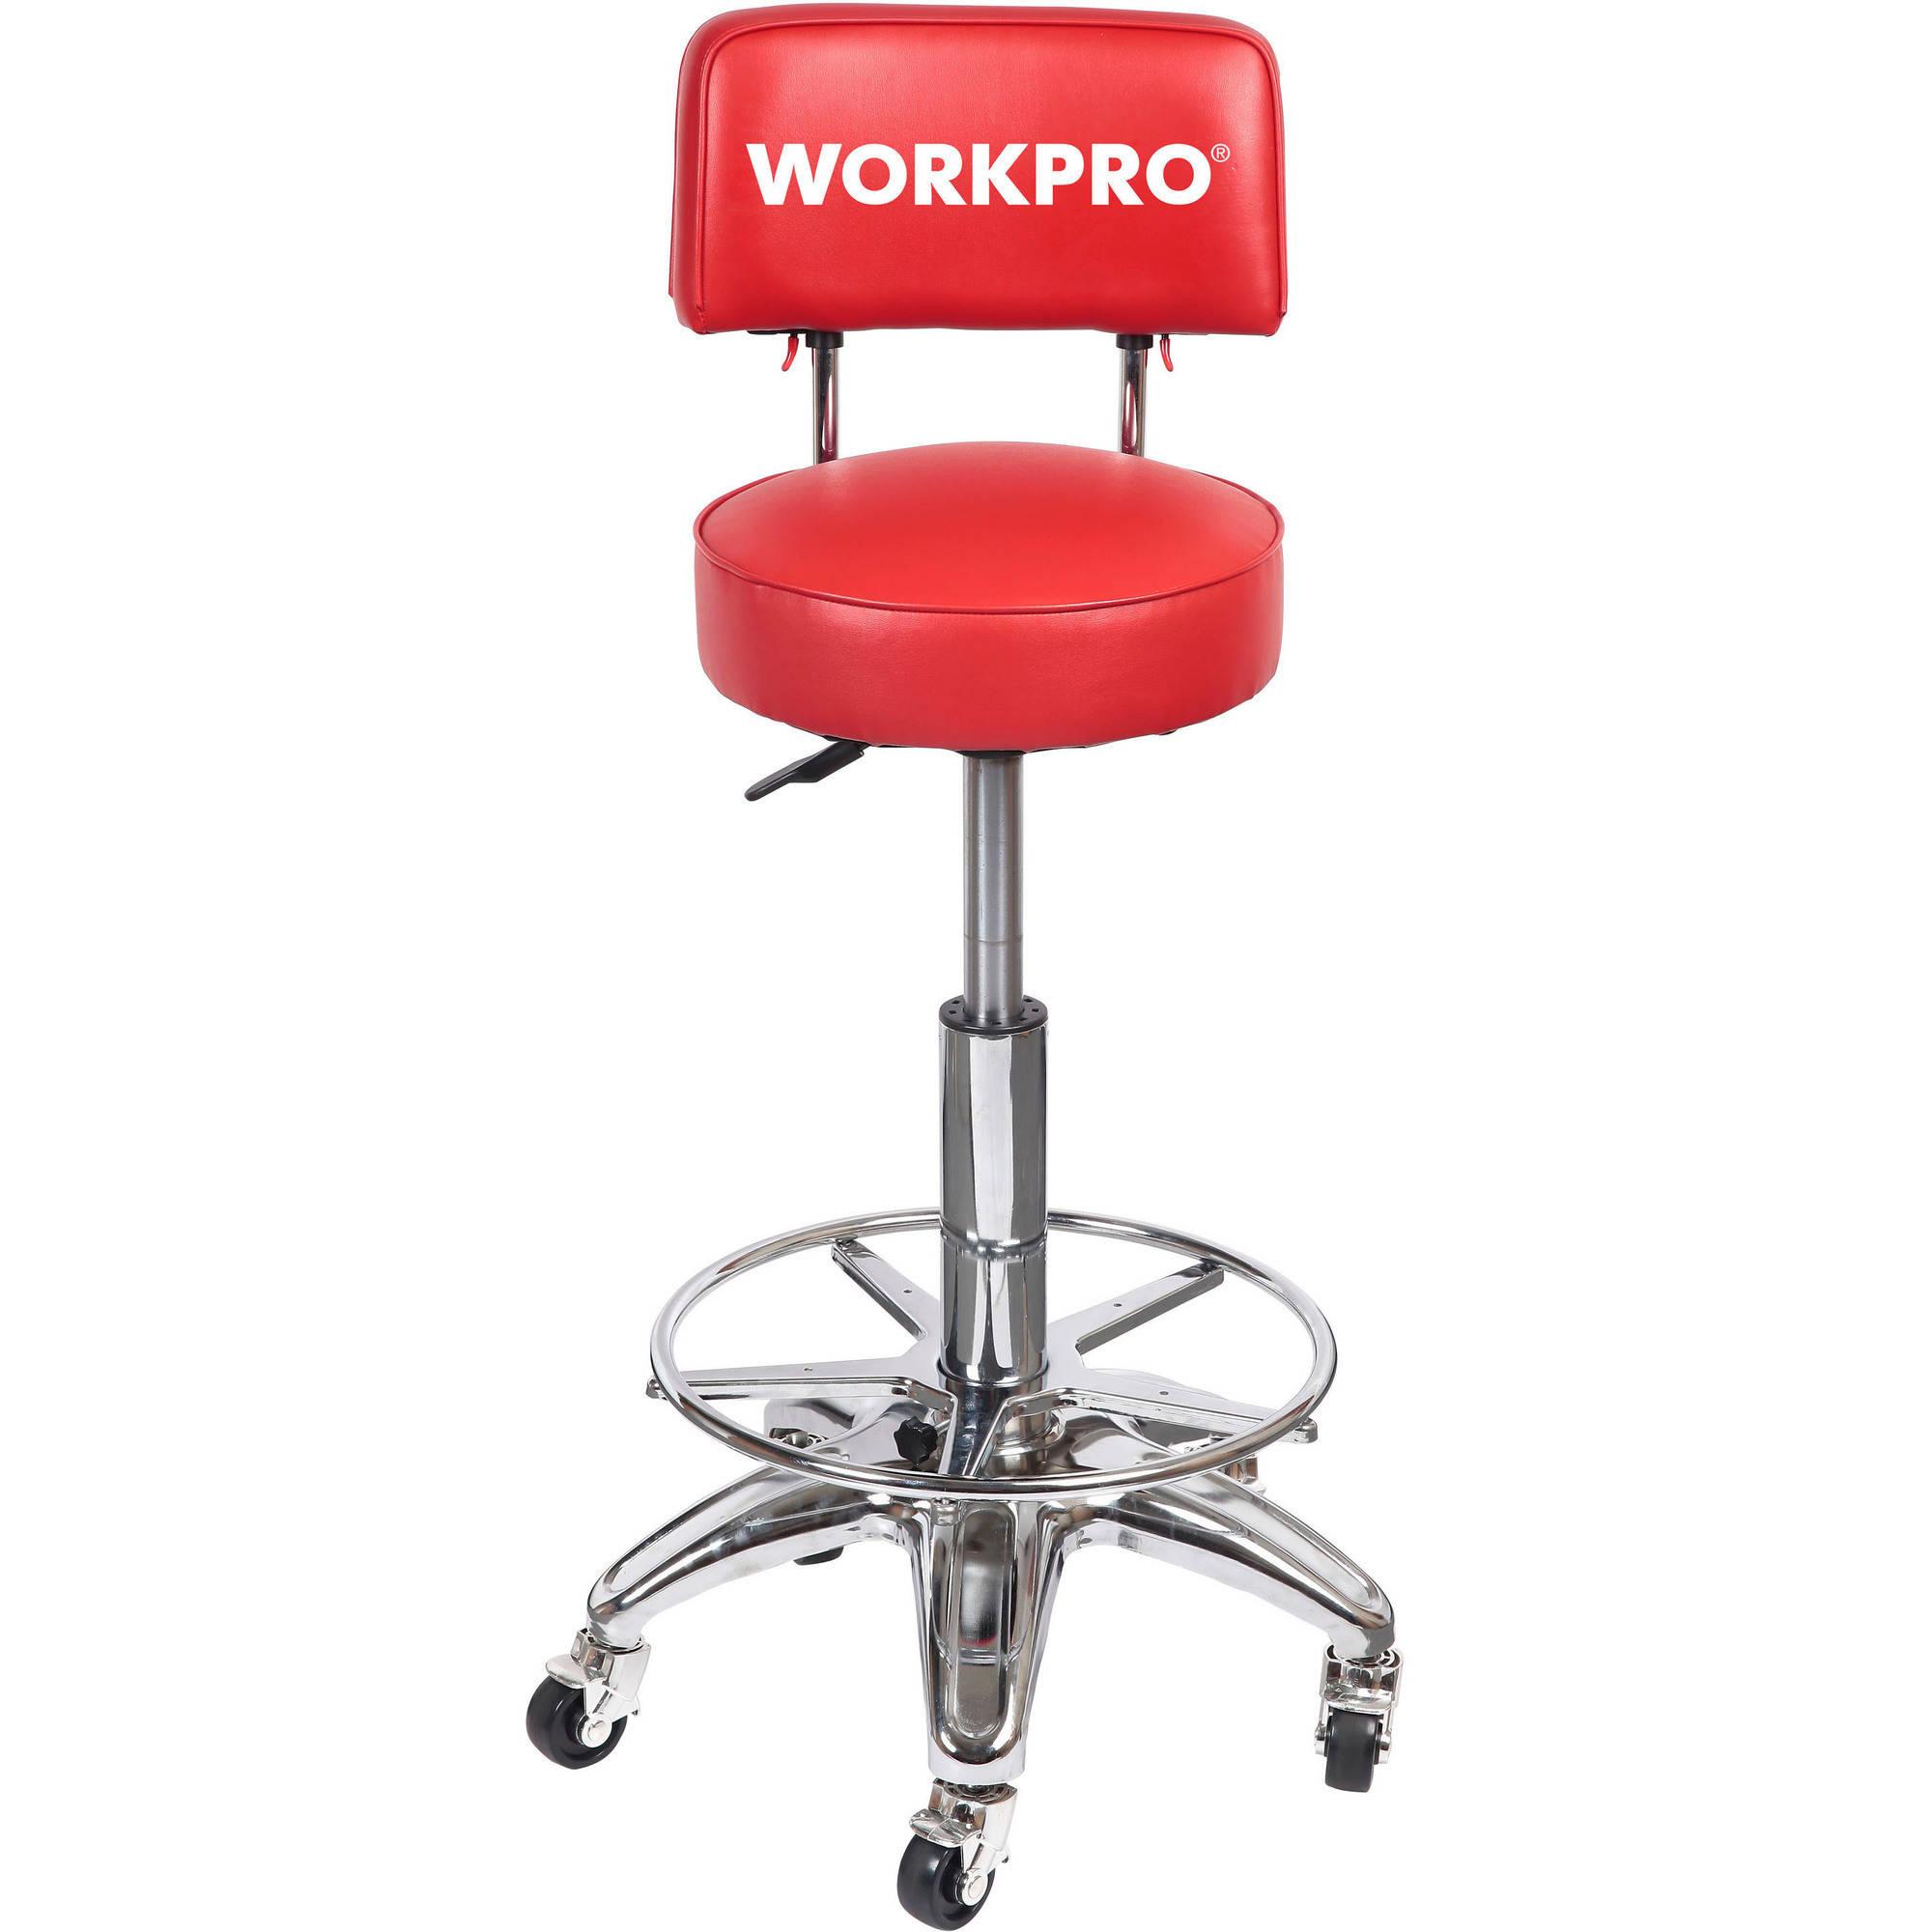 Work Pro Shop Stool - Walmart.com